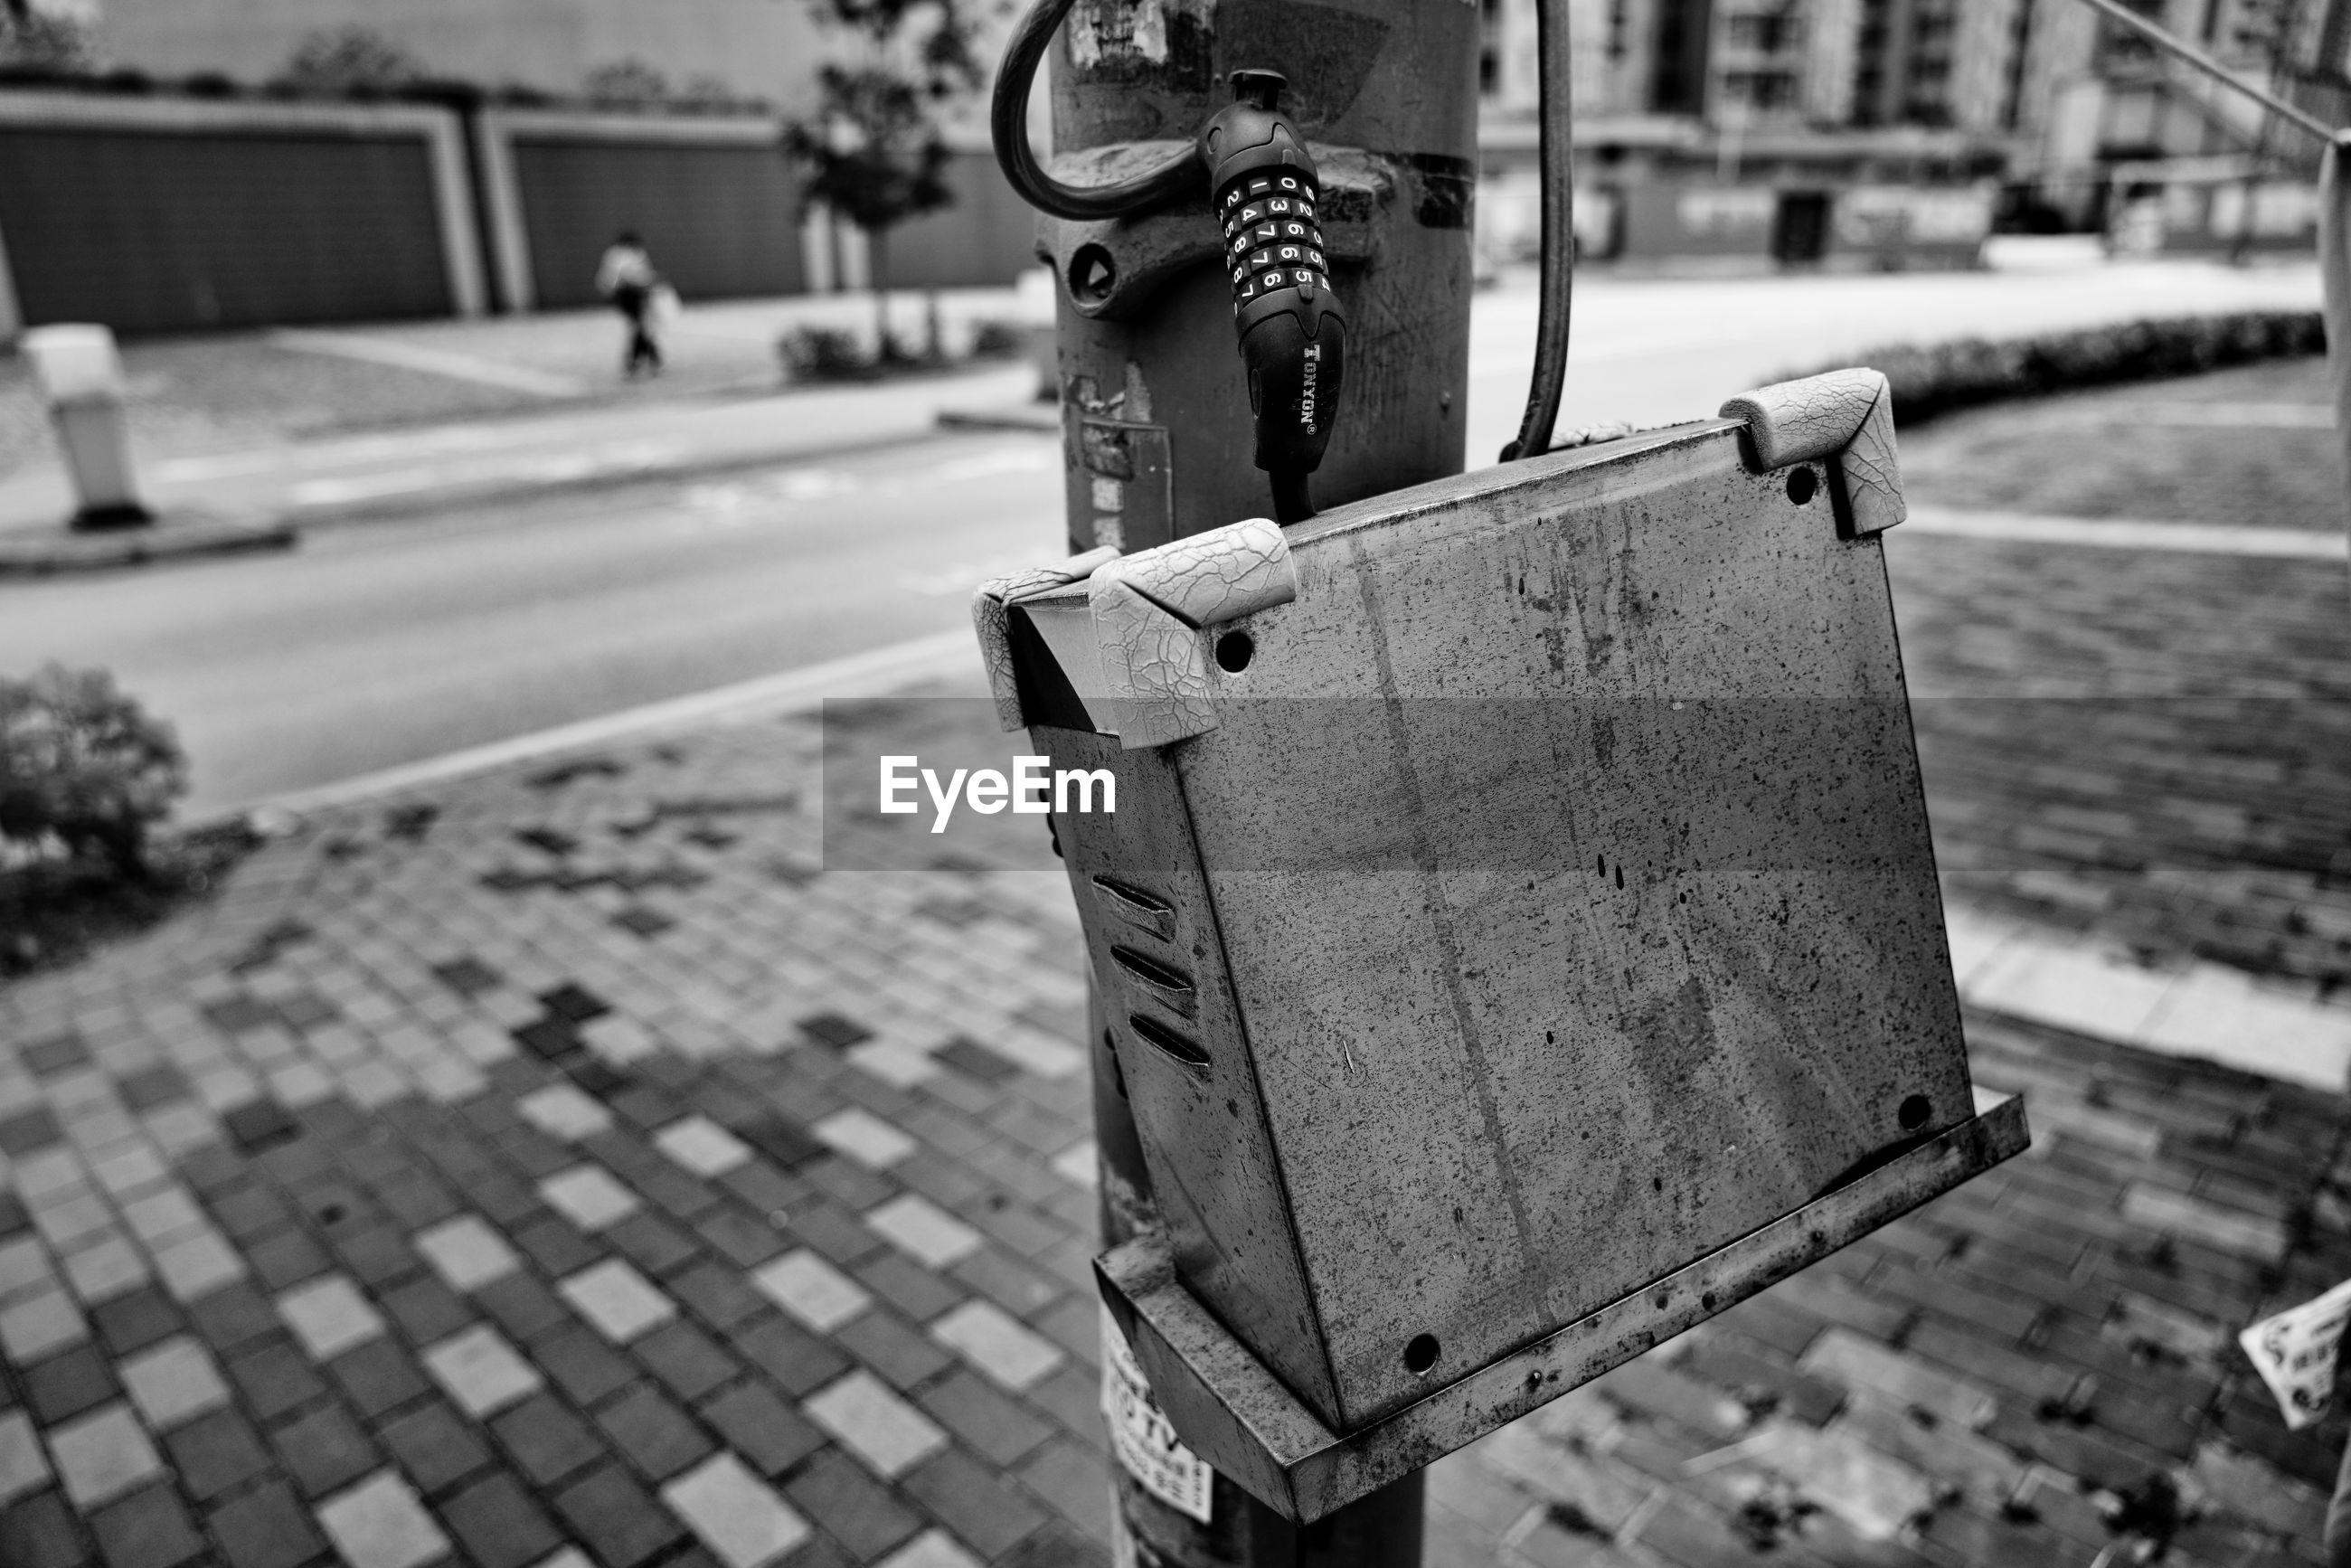 CLOSE-UP OF PADLOCK ON SIDEWALK BY FOOTPATH